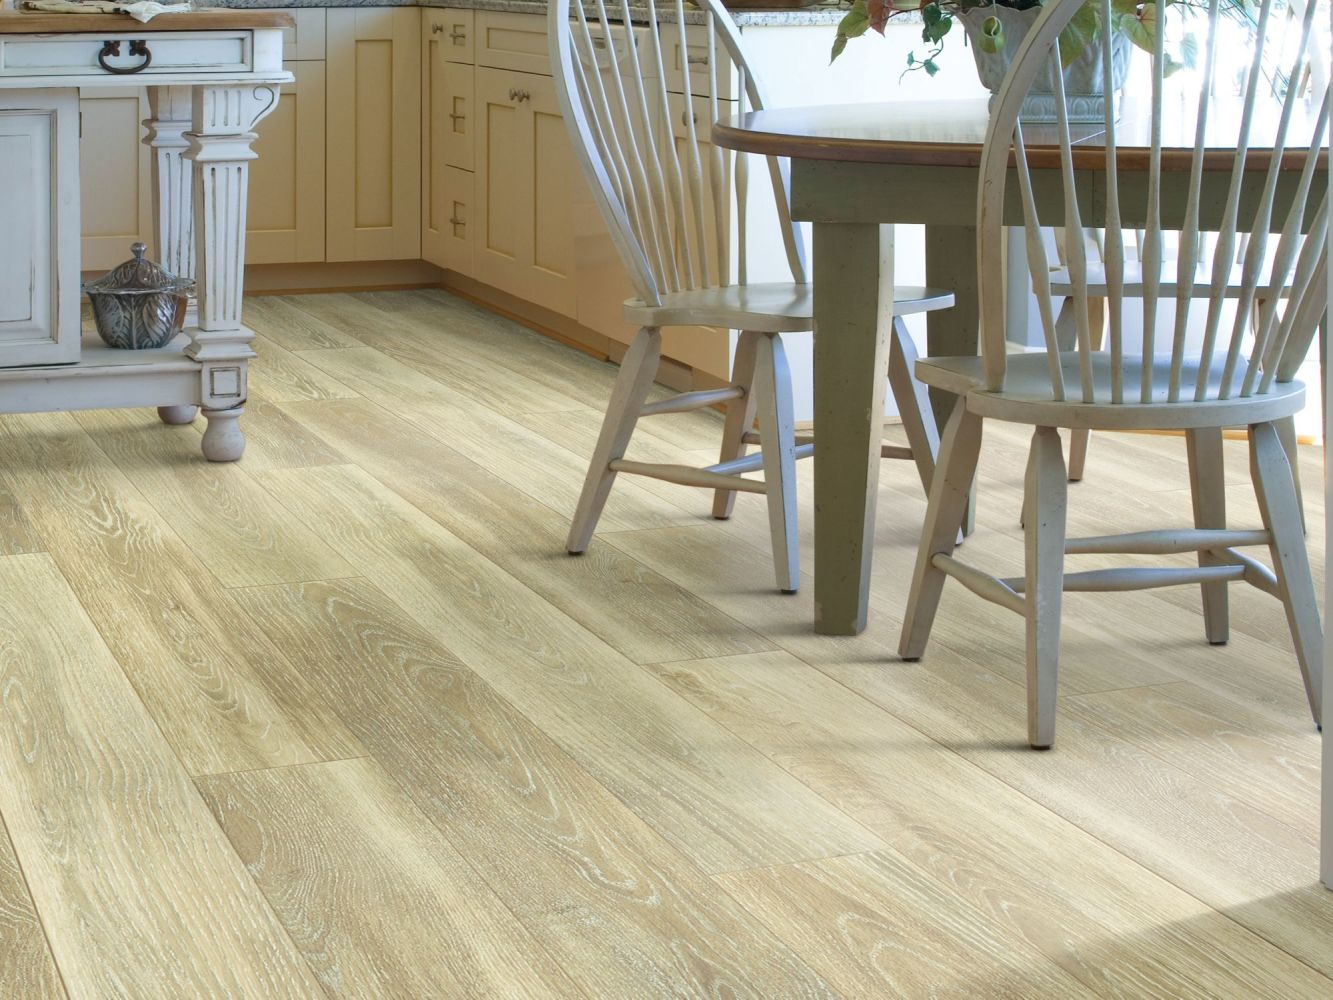 Shaw Floors Dr Horton Hampton Plus Vieste 00268_DR012